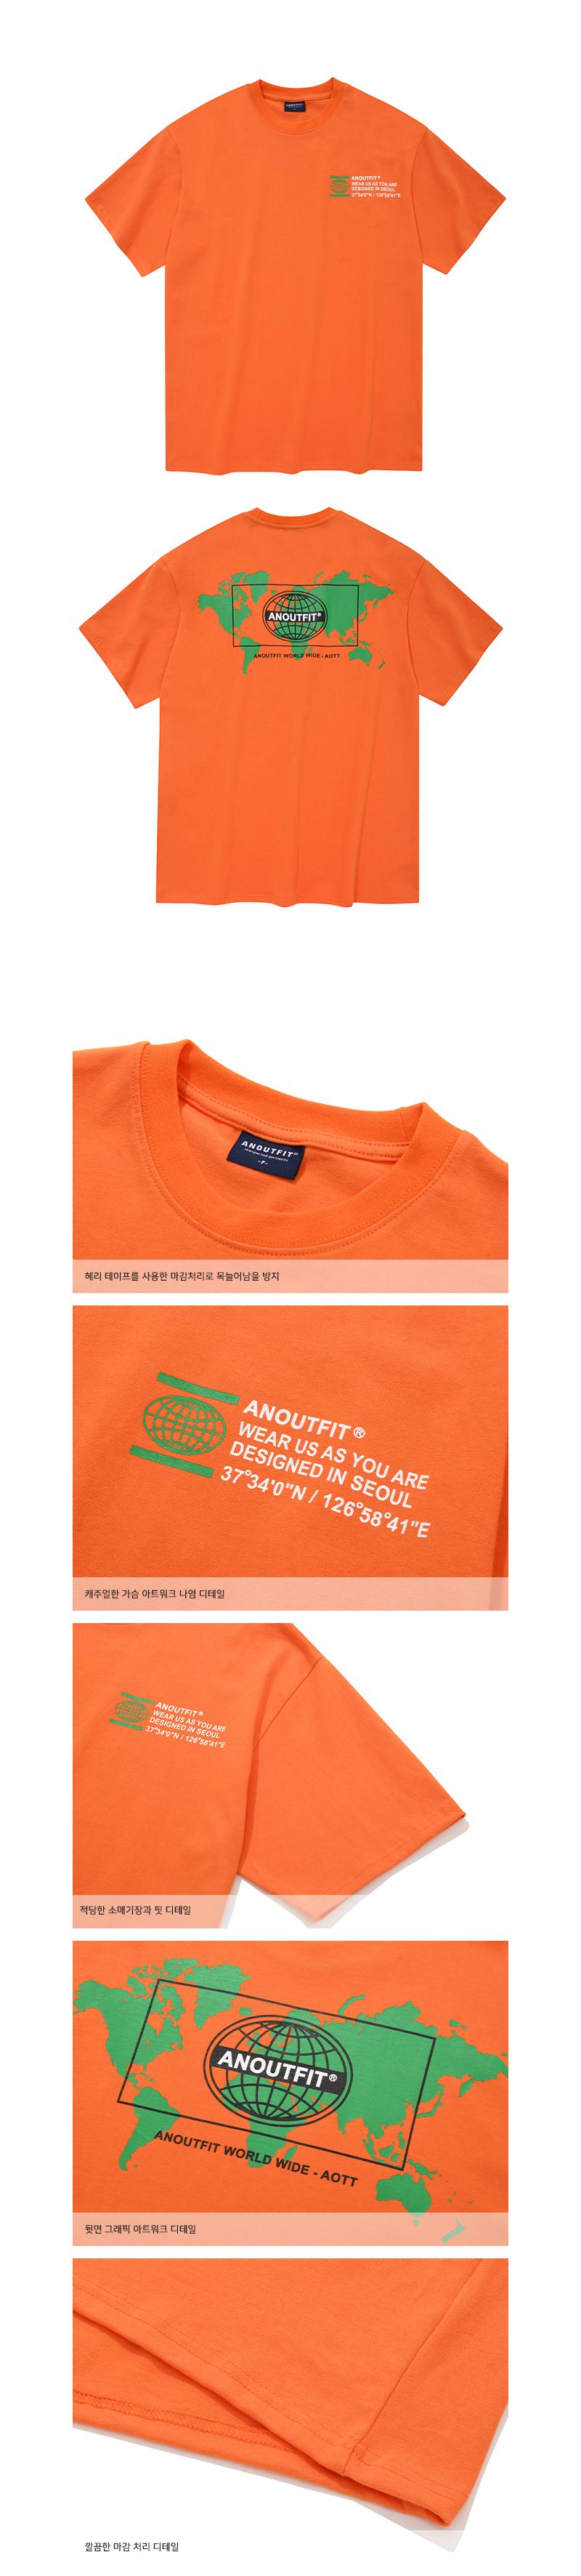 09_orange_DETAIL.jpg